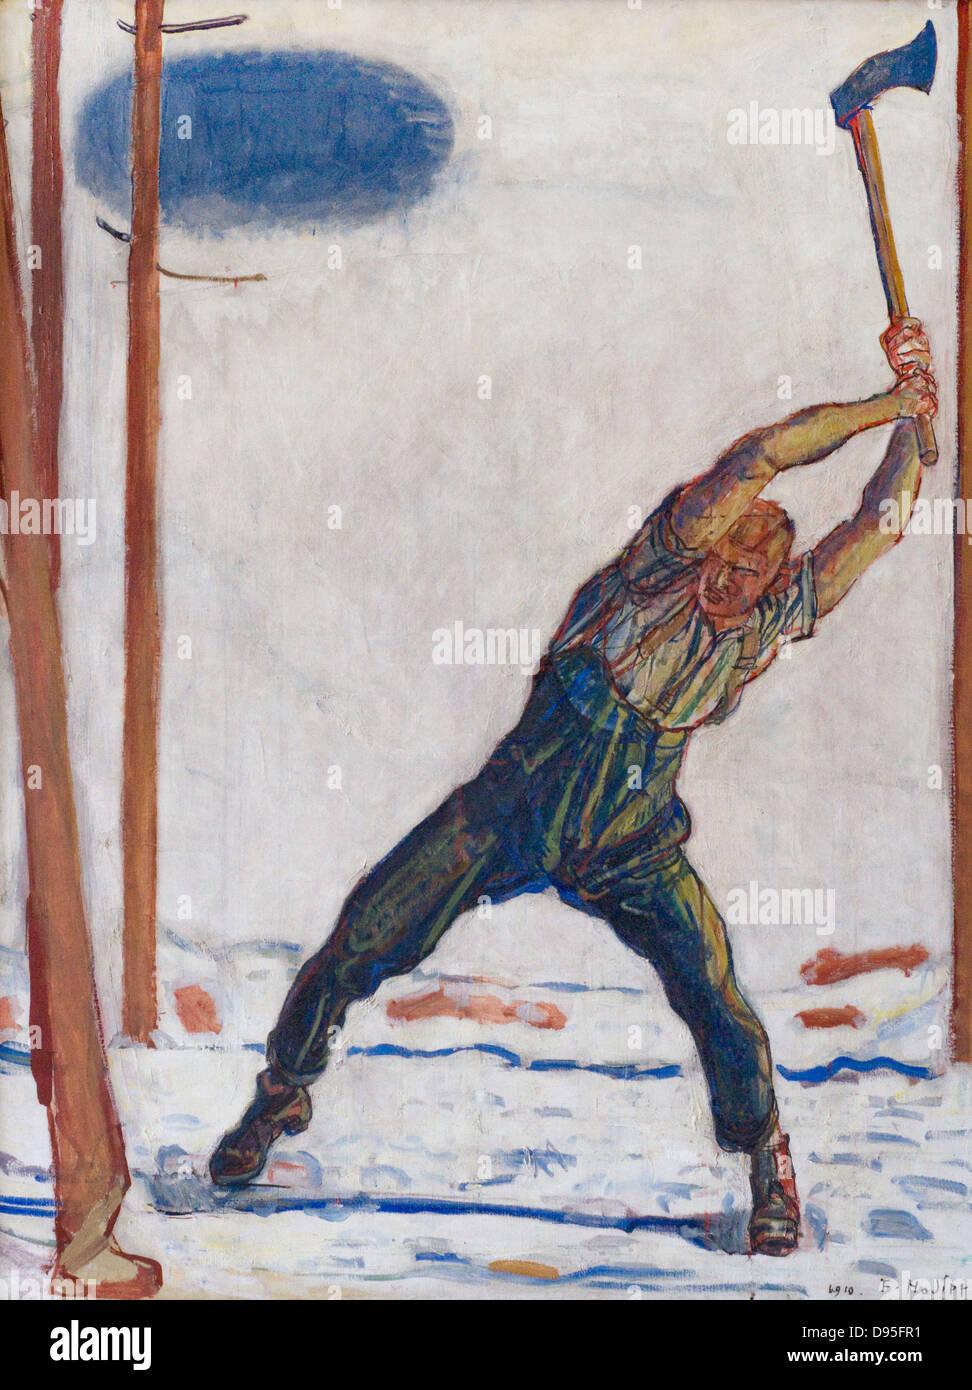 Ferdinand Hodler Le Bûcheron (Der Holzfäller) 1910 XX secolo Olio su tela Museo Orsay - Parigi Immagini Stock